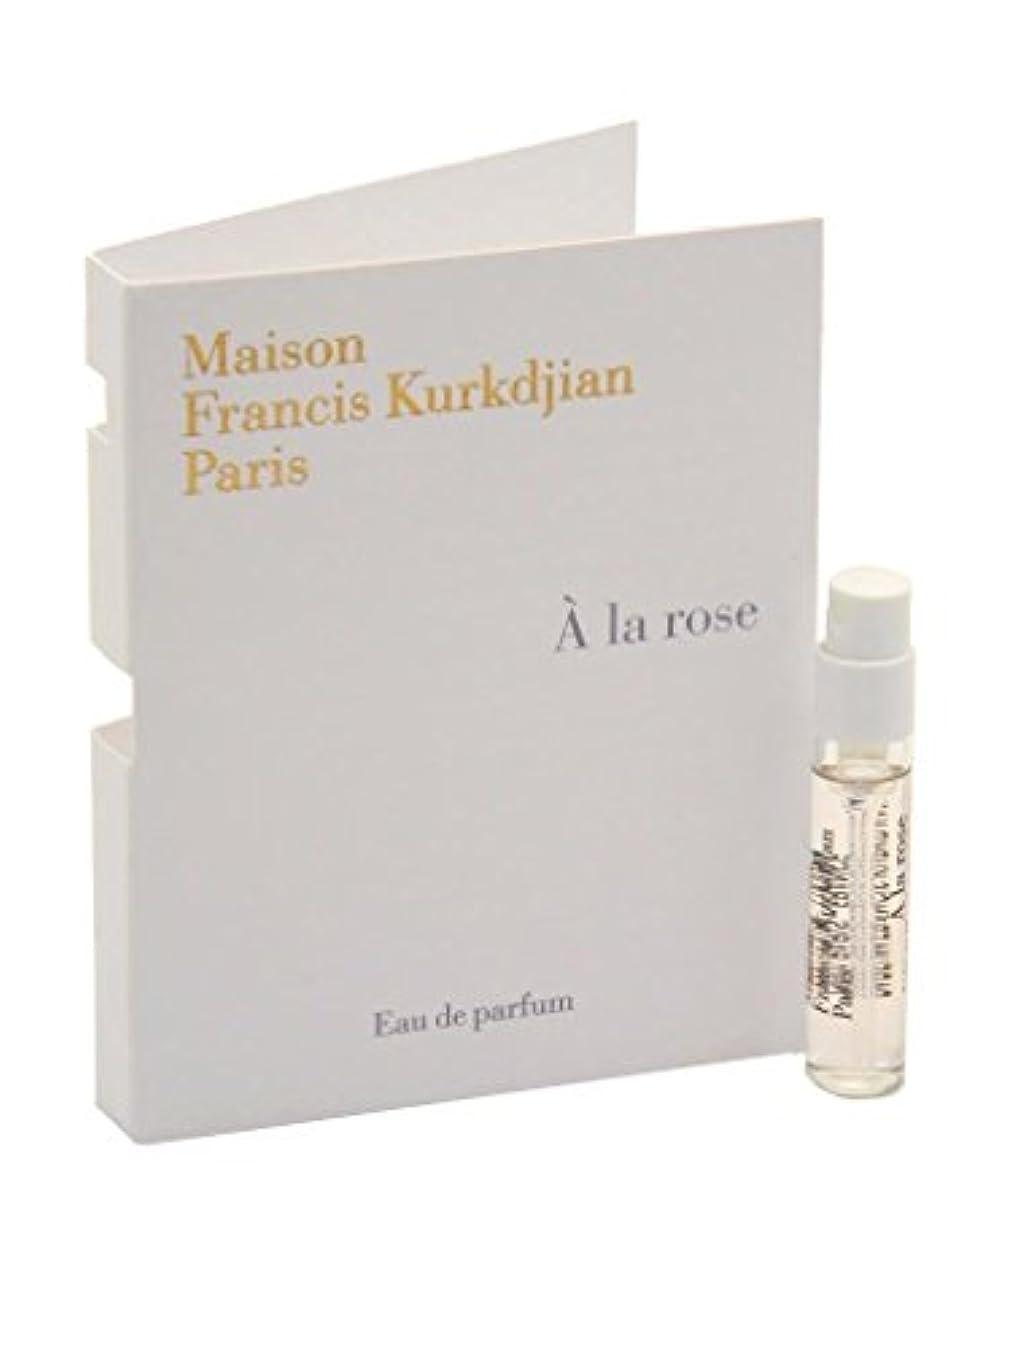 Maison Francis Kurkdjian A La Rose EDP Vial Sample 2ml(メゾン フランシス クルジャン ア ラ ローズ オードパルファン 2ml)[海外直送品] [並行輸入品]